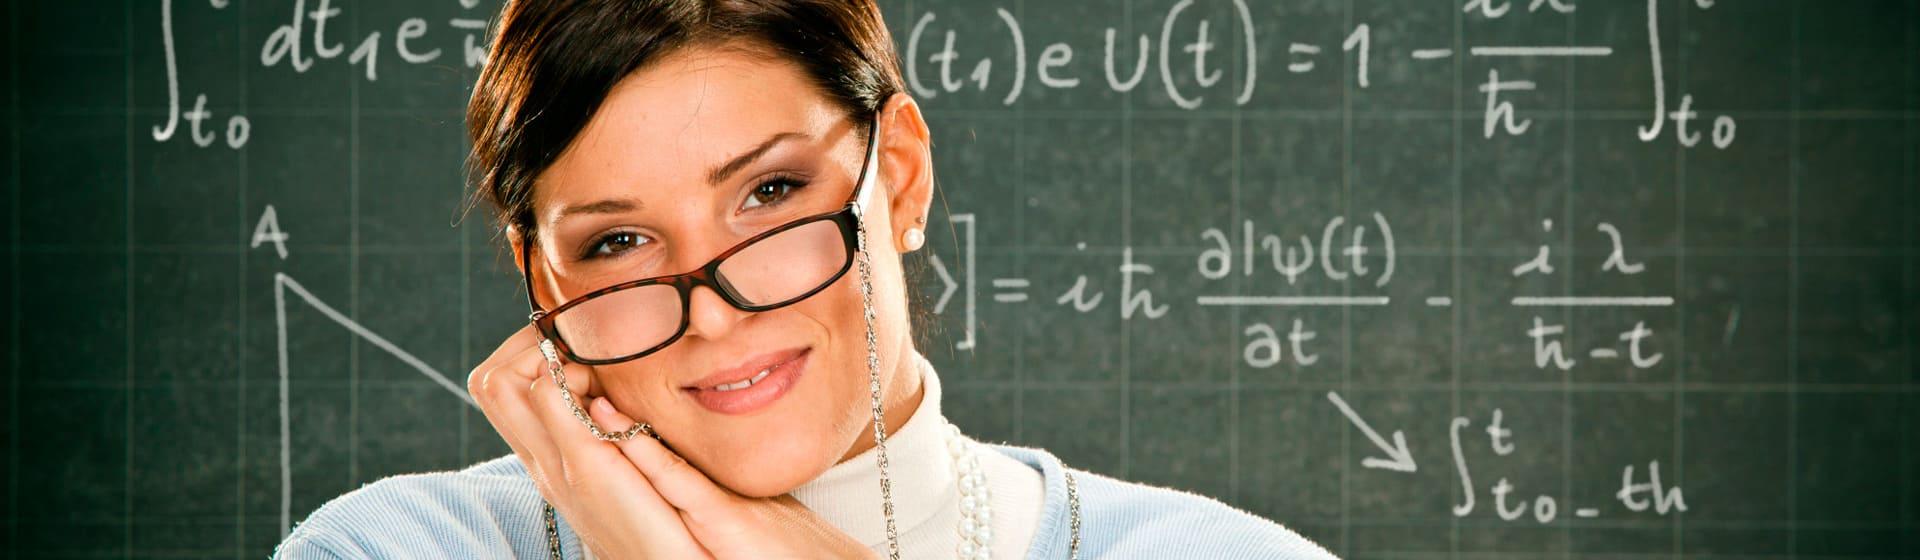 Учитель - Женские бомберы